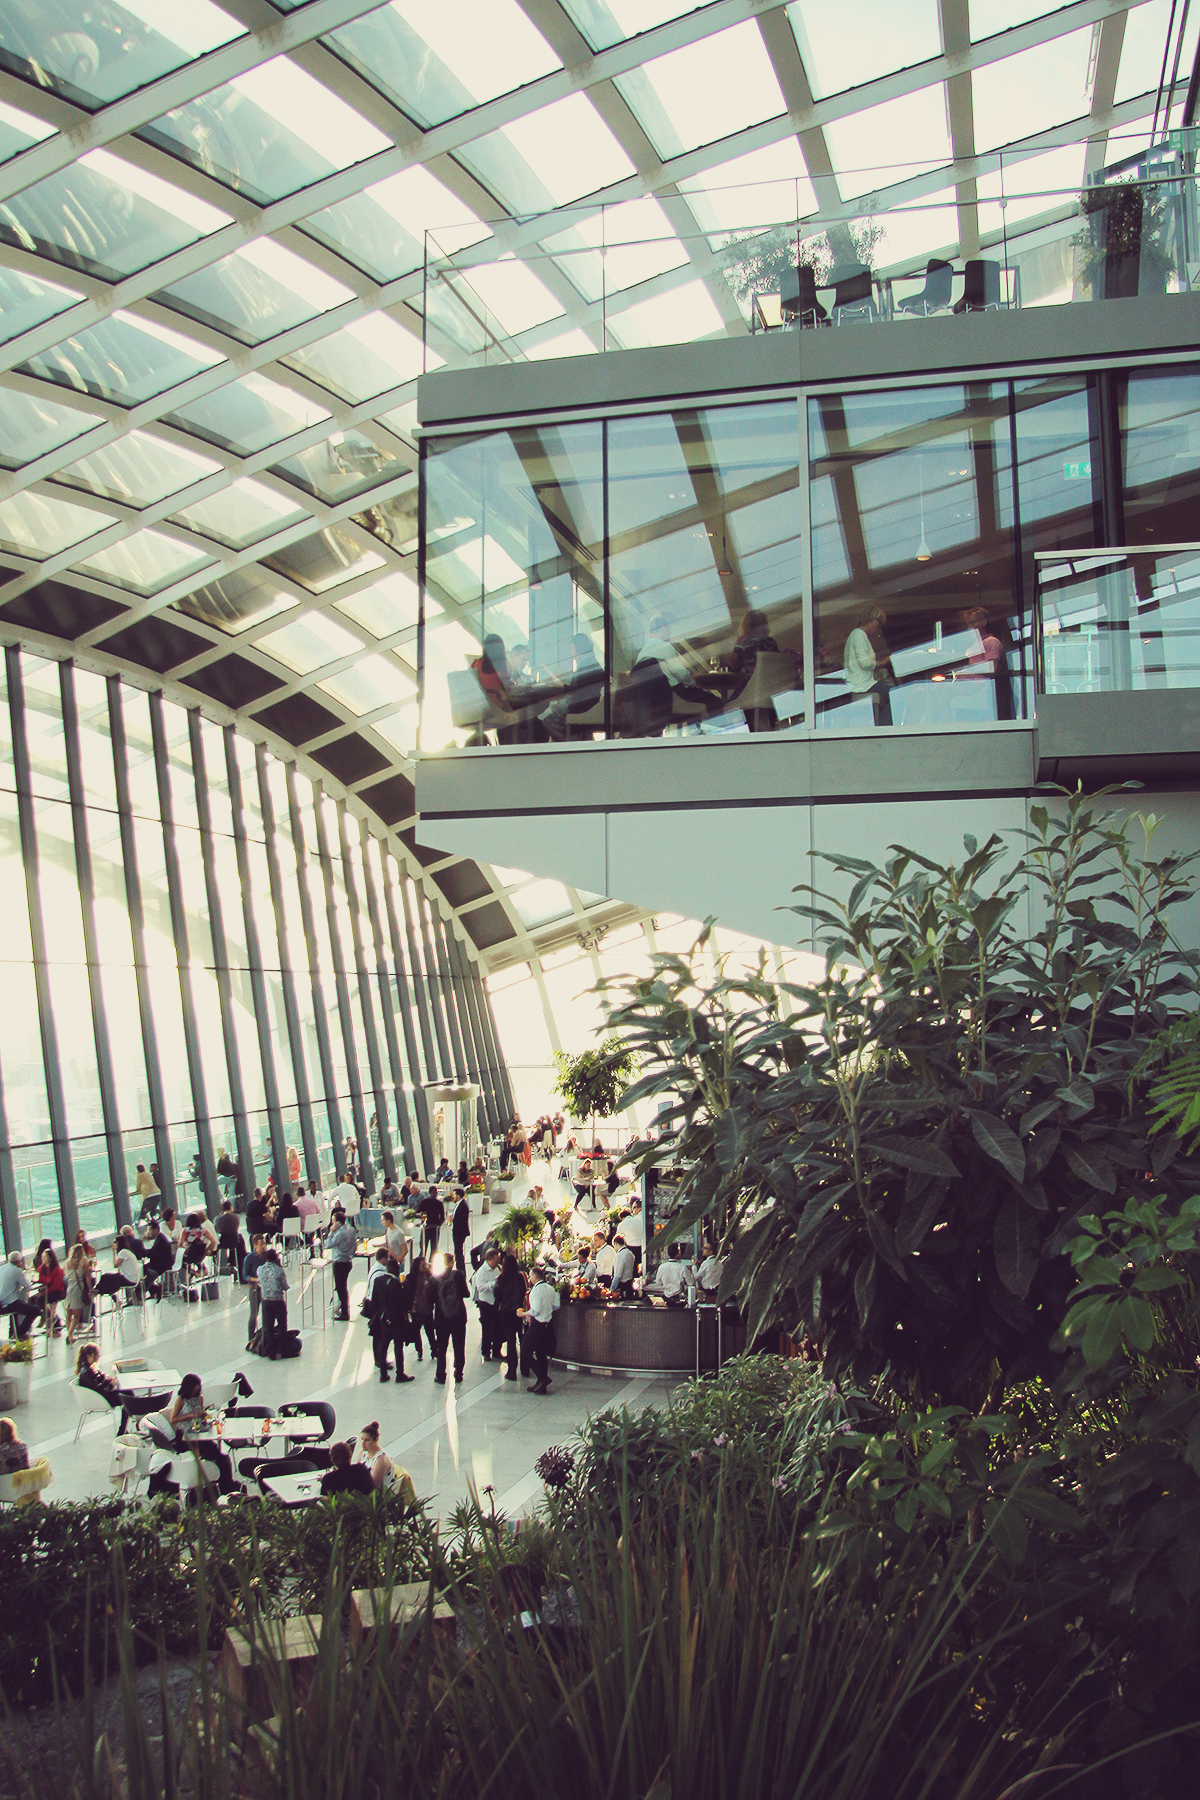 london-inside-sky-garden